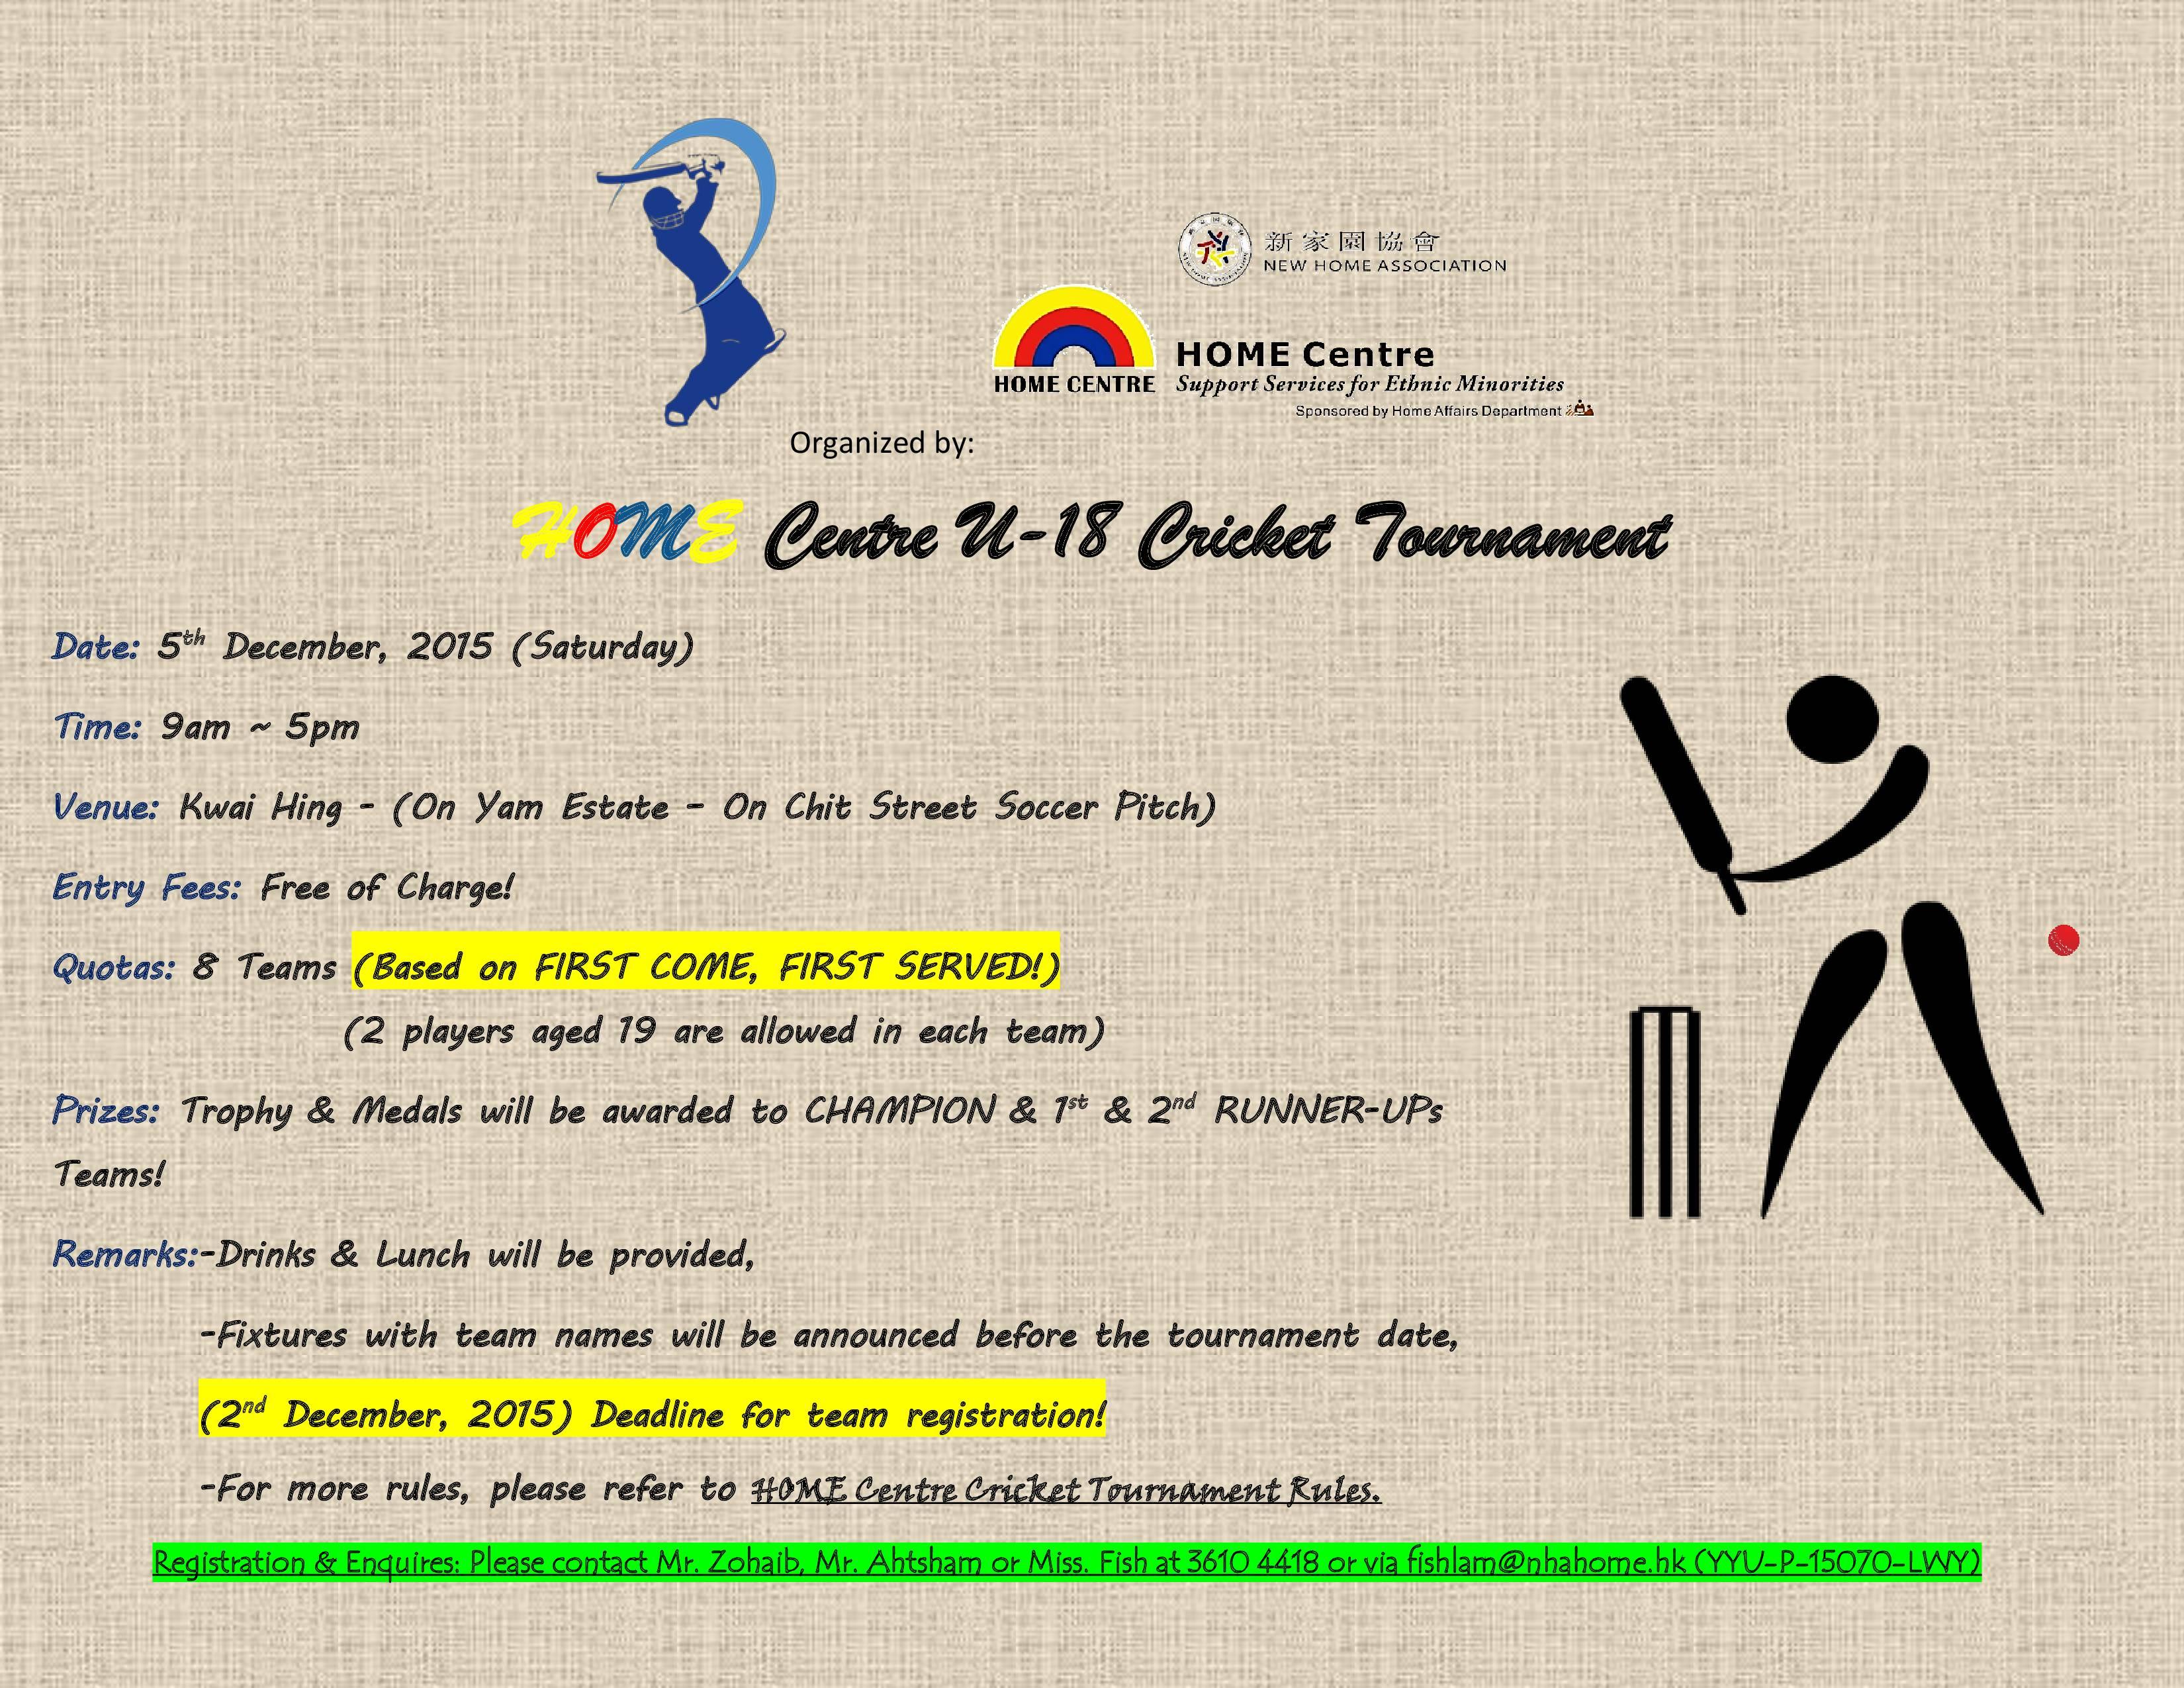 Cricket Tournament Anouncment Wording: Youth Unit:Home Centre U-18 Cricket